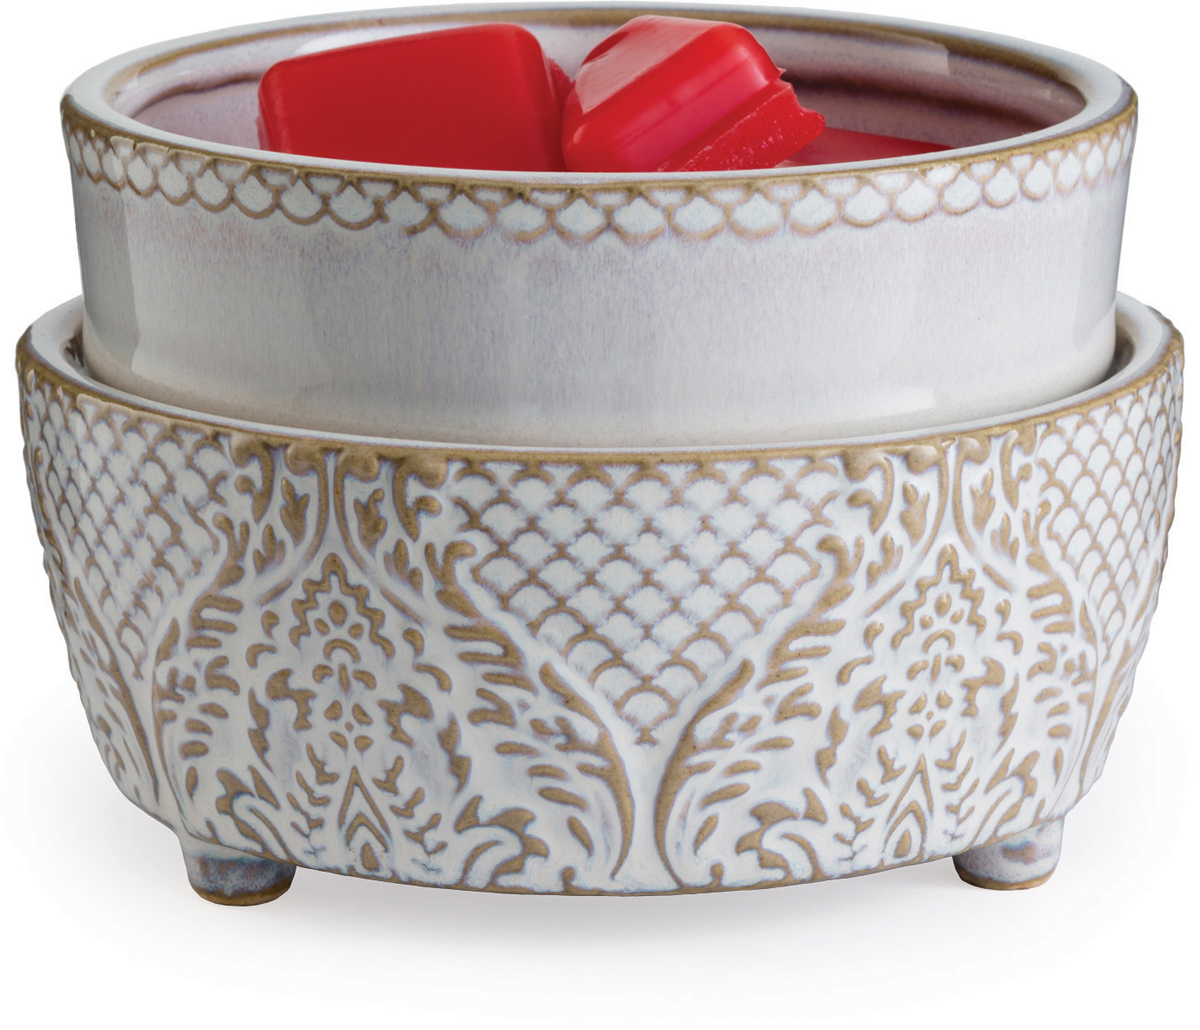 Воскоплав Candle Warmers Белый винтаж / Vintage White, цвет: бело-золотой vintage striped pattern knit leg warmers